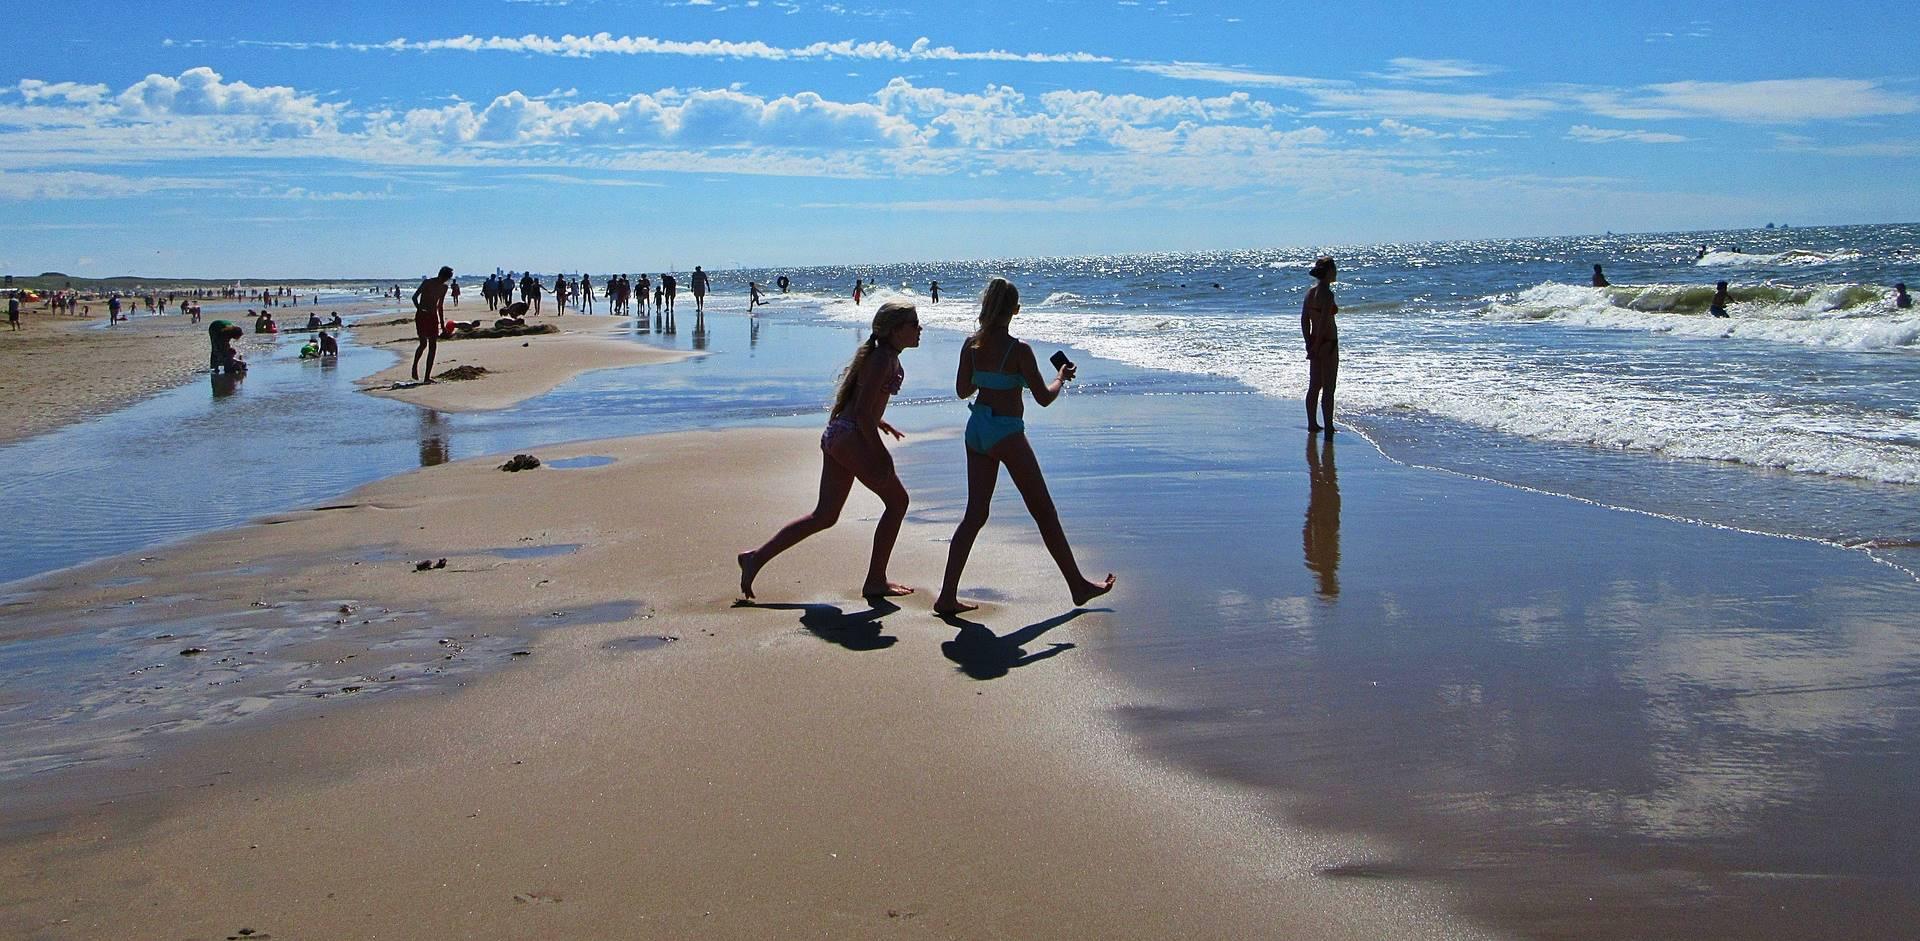 Zakkenrollerij aan de kust piekt in de zomer